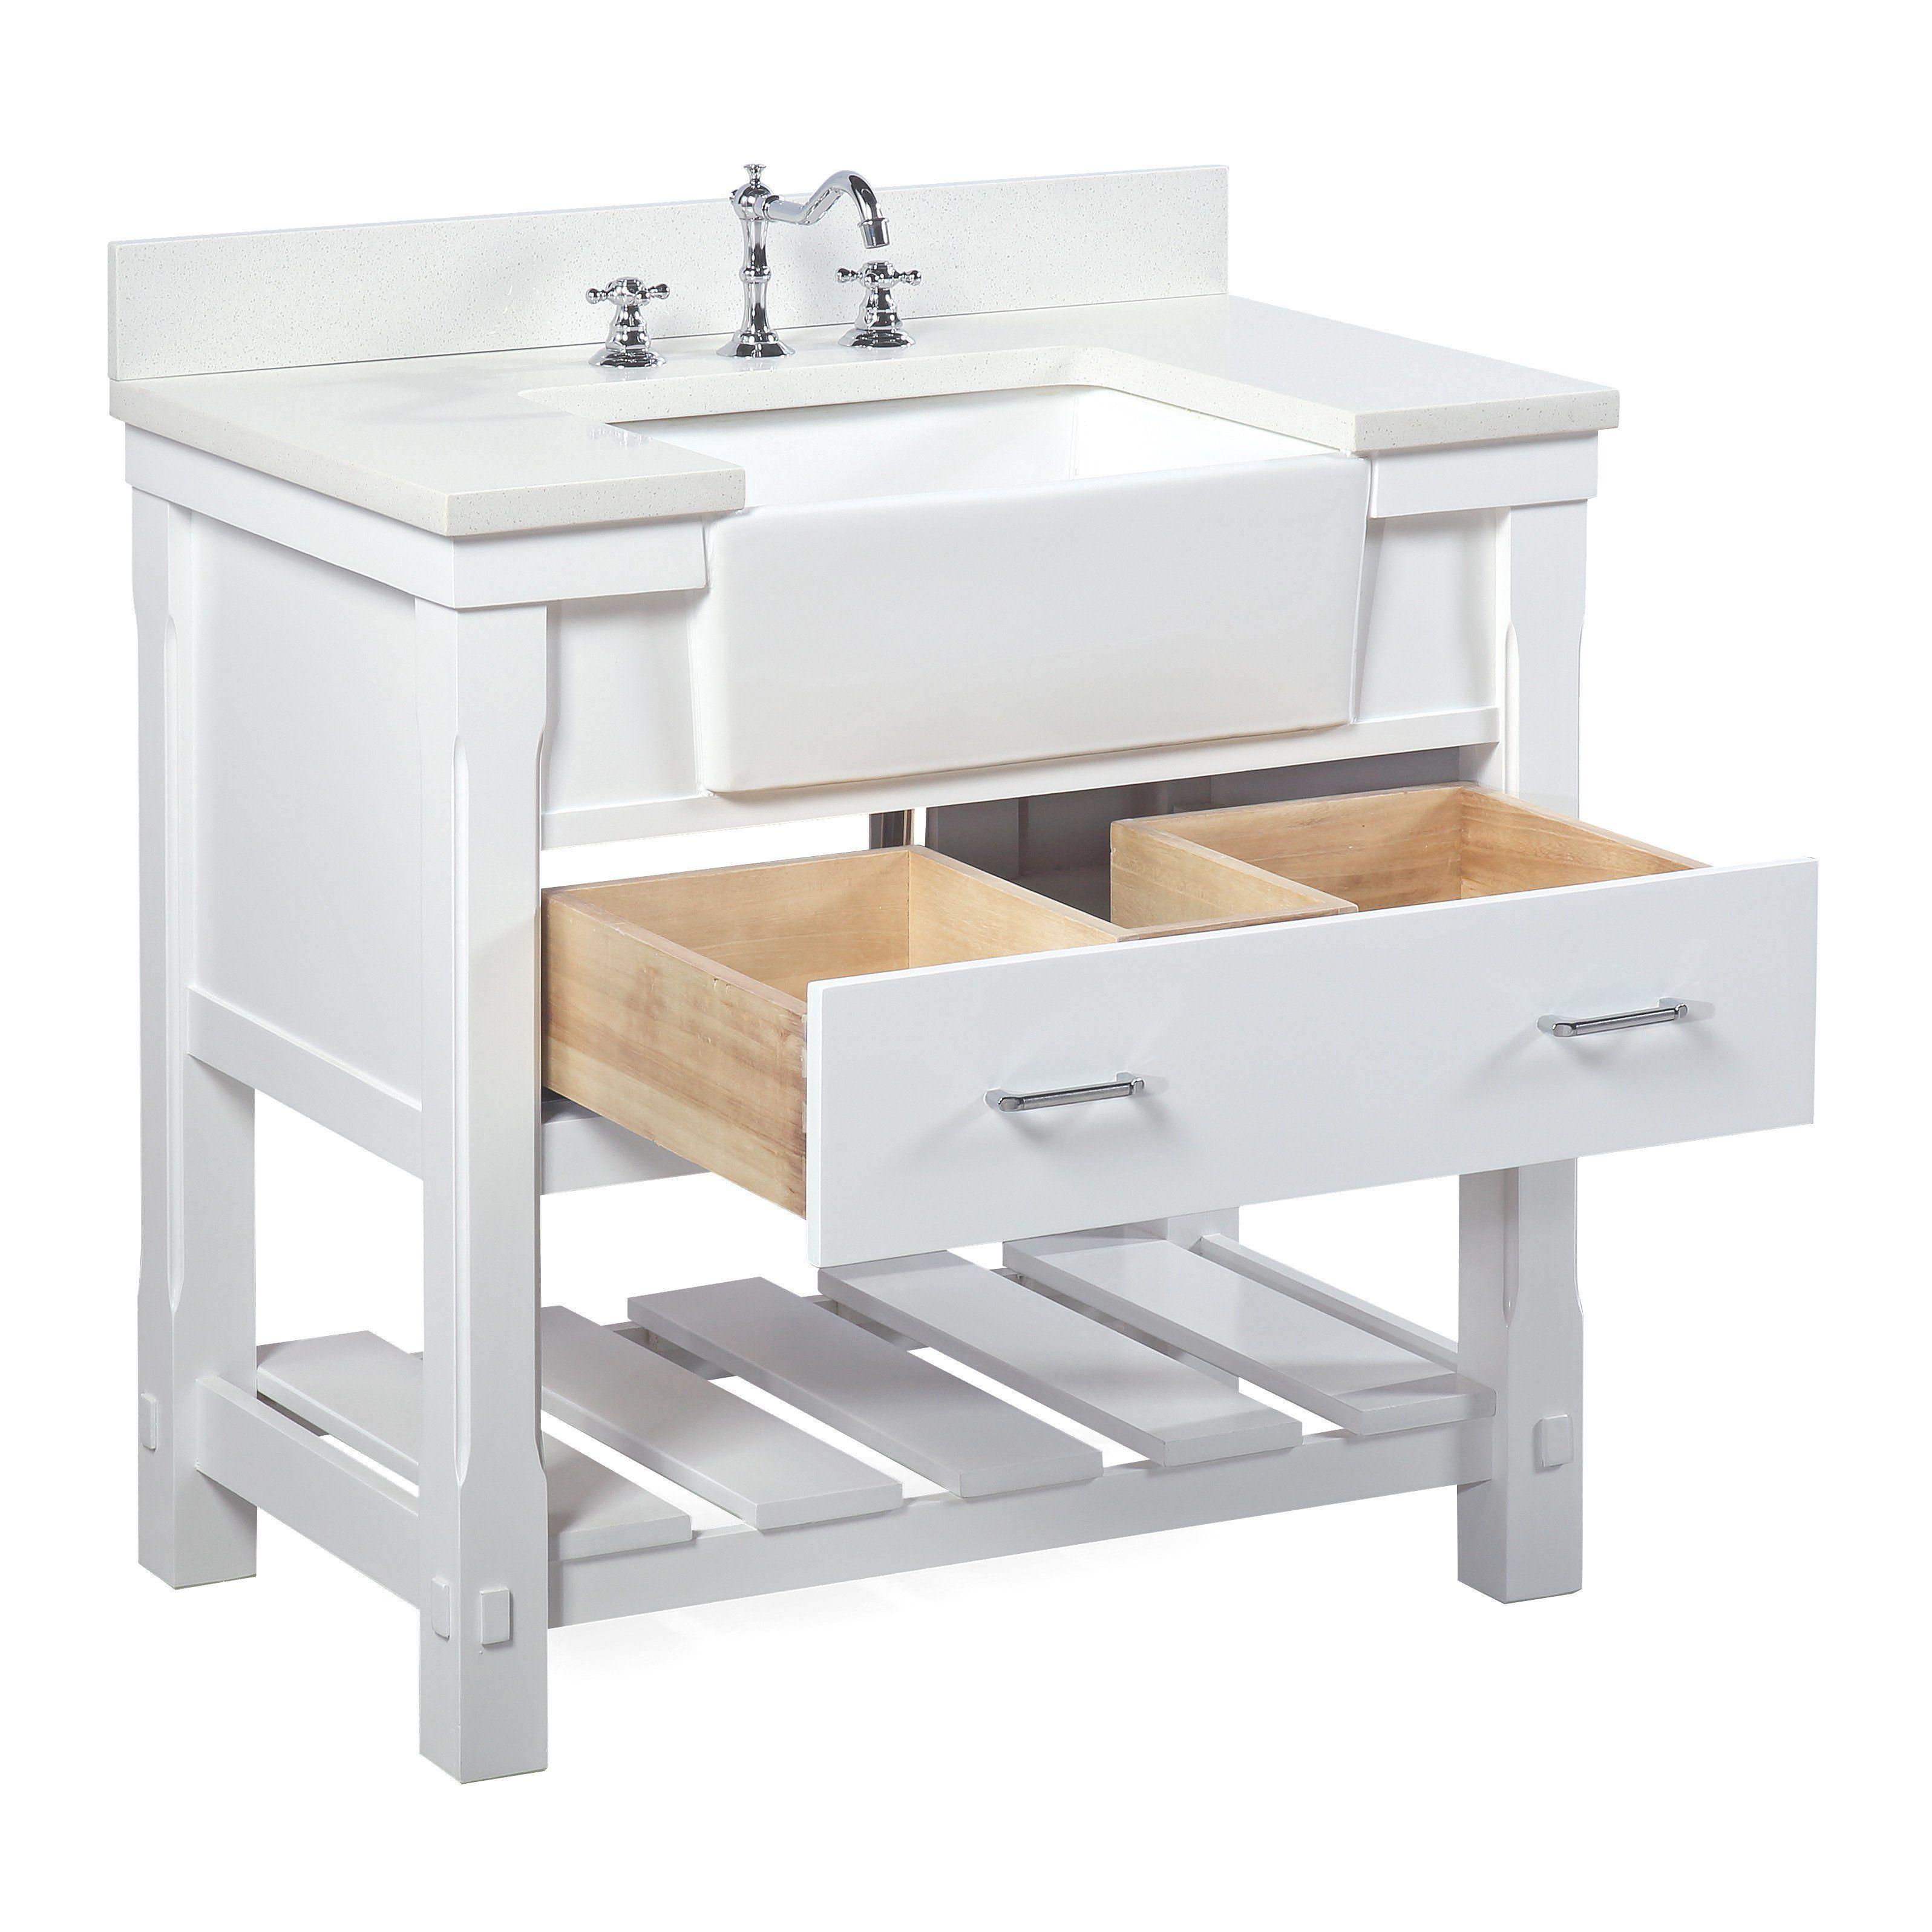 Charlotte 36 Inch Farmhouse Vanity With Quartz Top In 2021 Single Bathroom Vanity Farmhouse Vanity Laundry Room Sink [ 3193 x 3193 Pixel ]